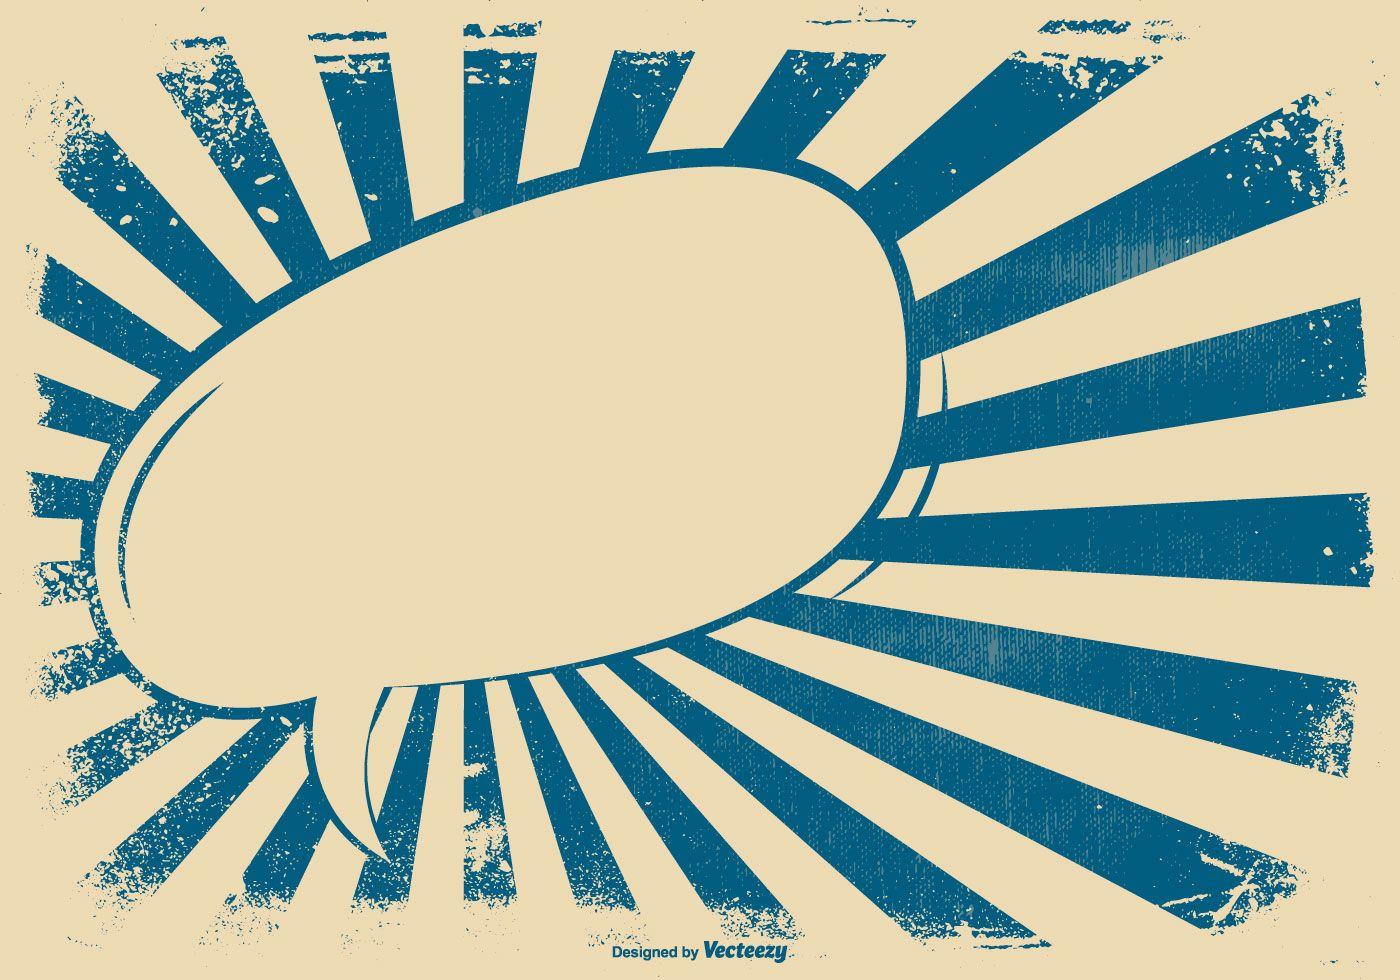 Grunge Comic Style Background Vector Art Design Vector Art Vintage Graphic Design